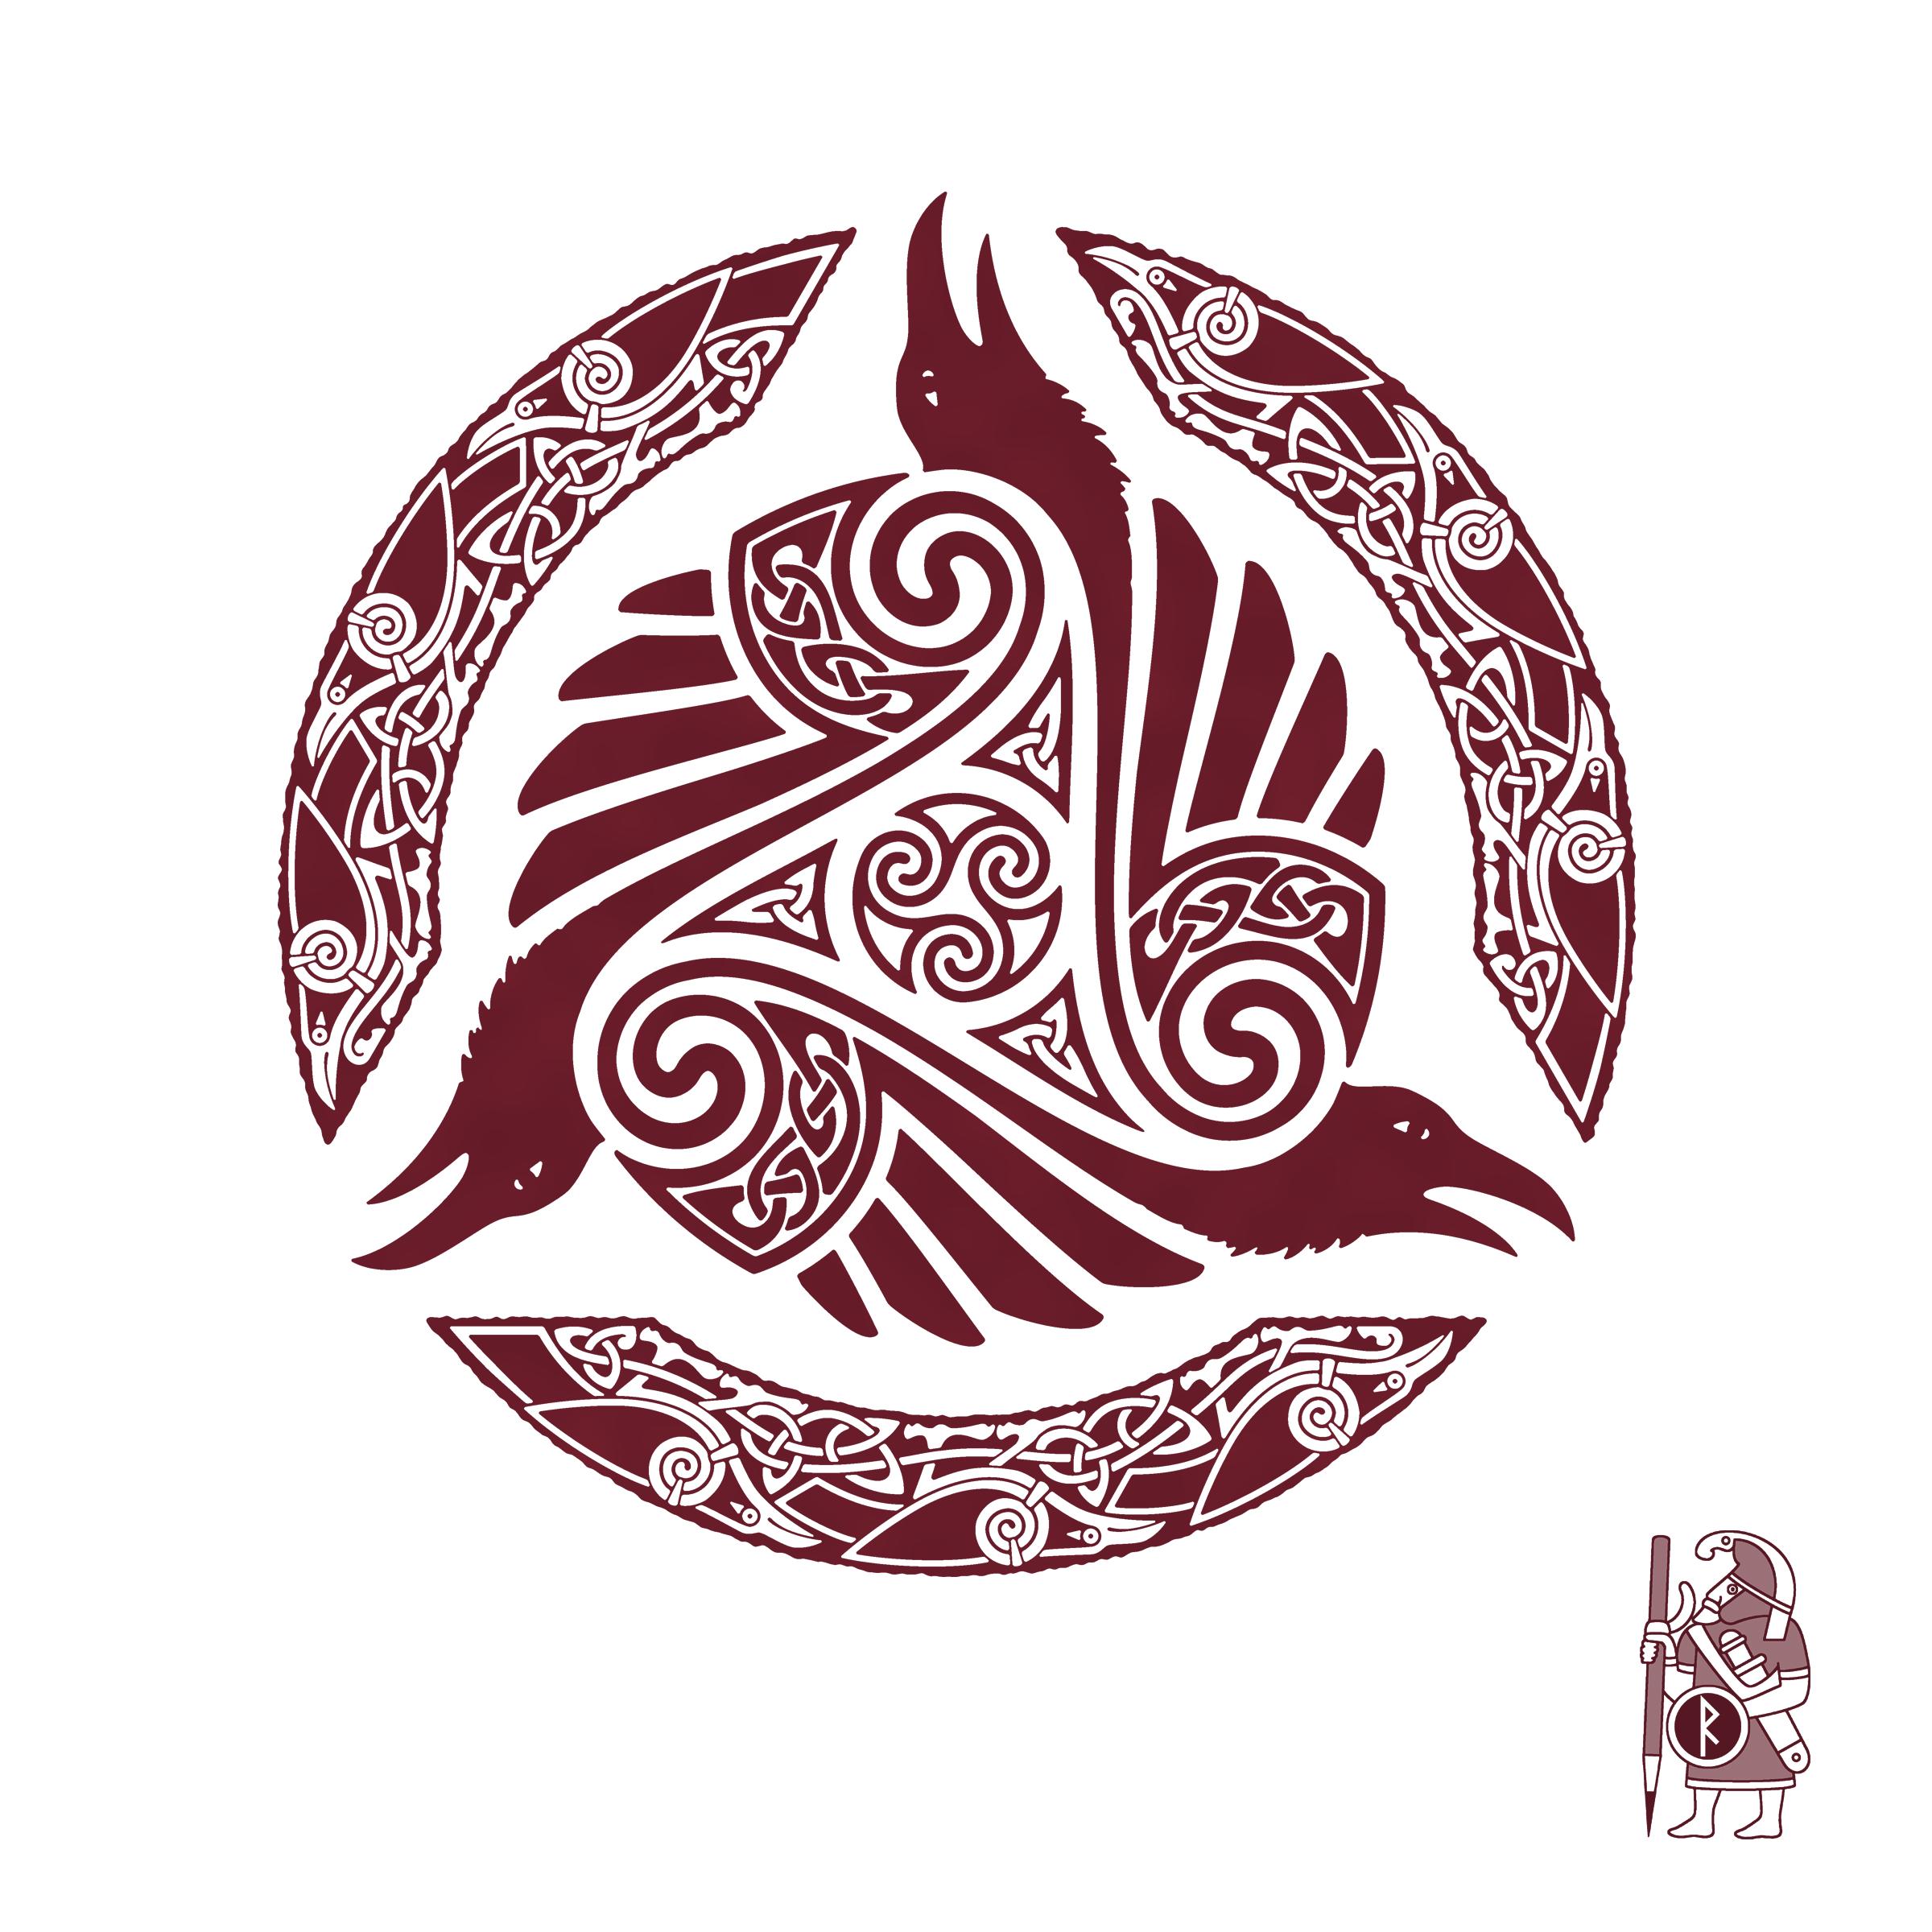 Raven Viking Tattoo: RAVEN'S FEAST. Ravens And Triskele Knotwork Tattoo Design